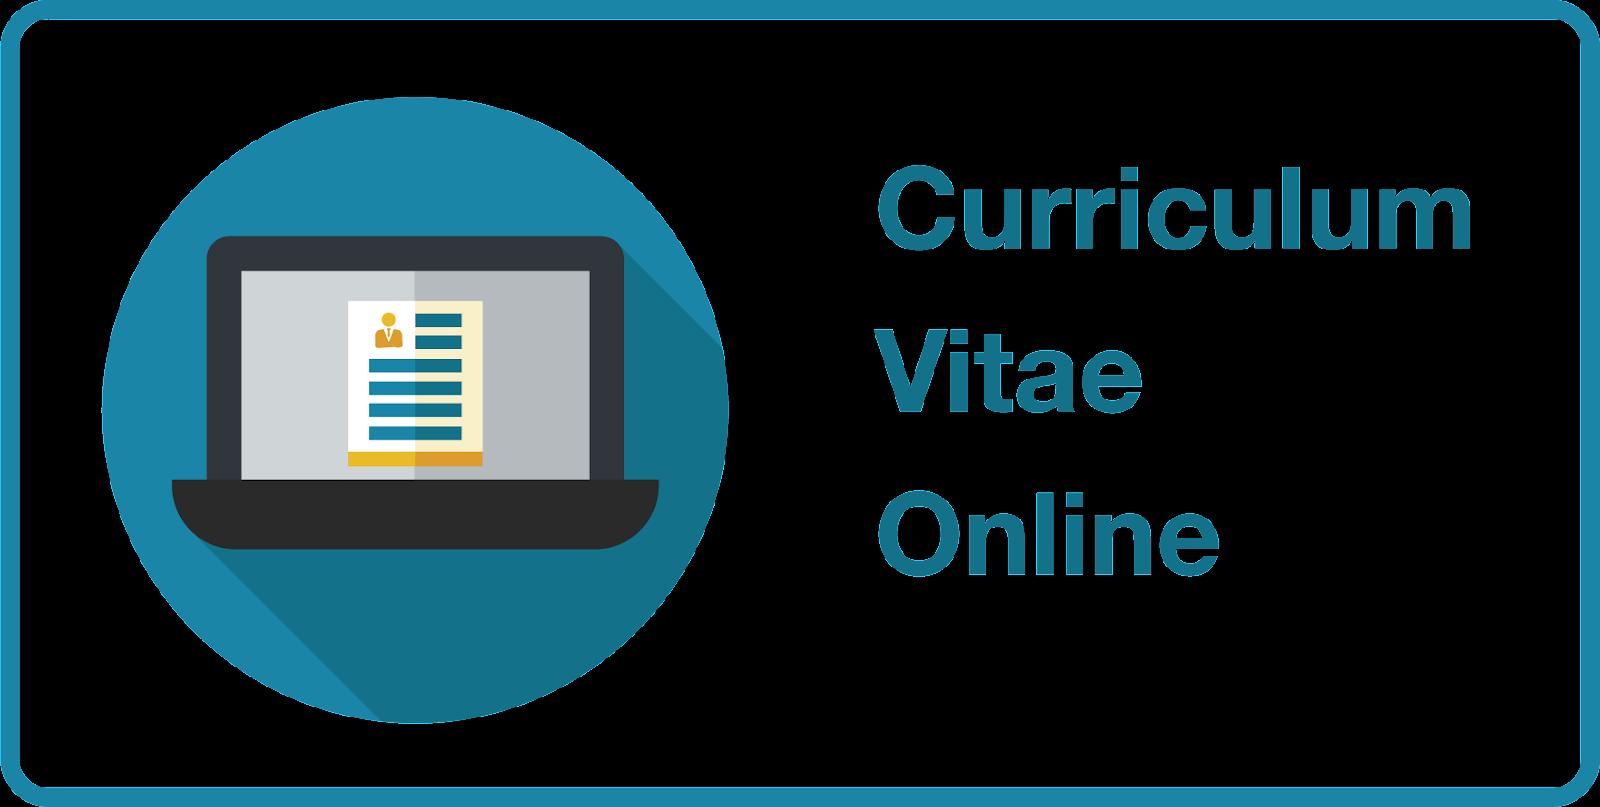 hacer curriculum online